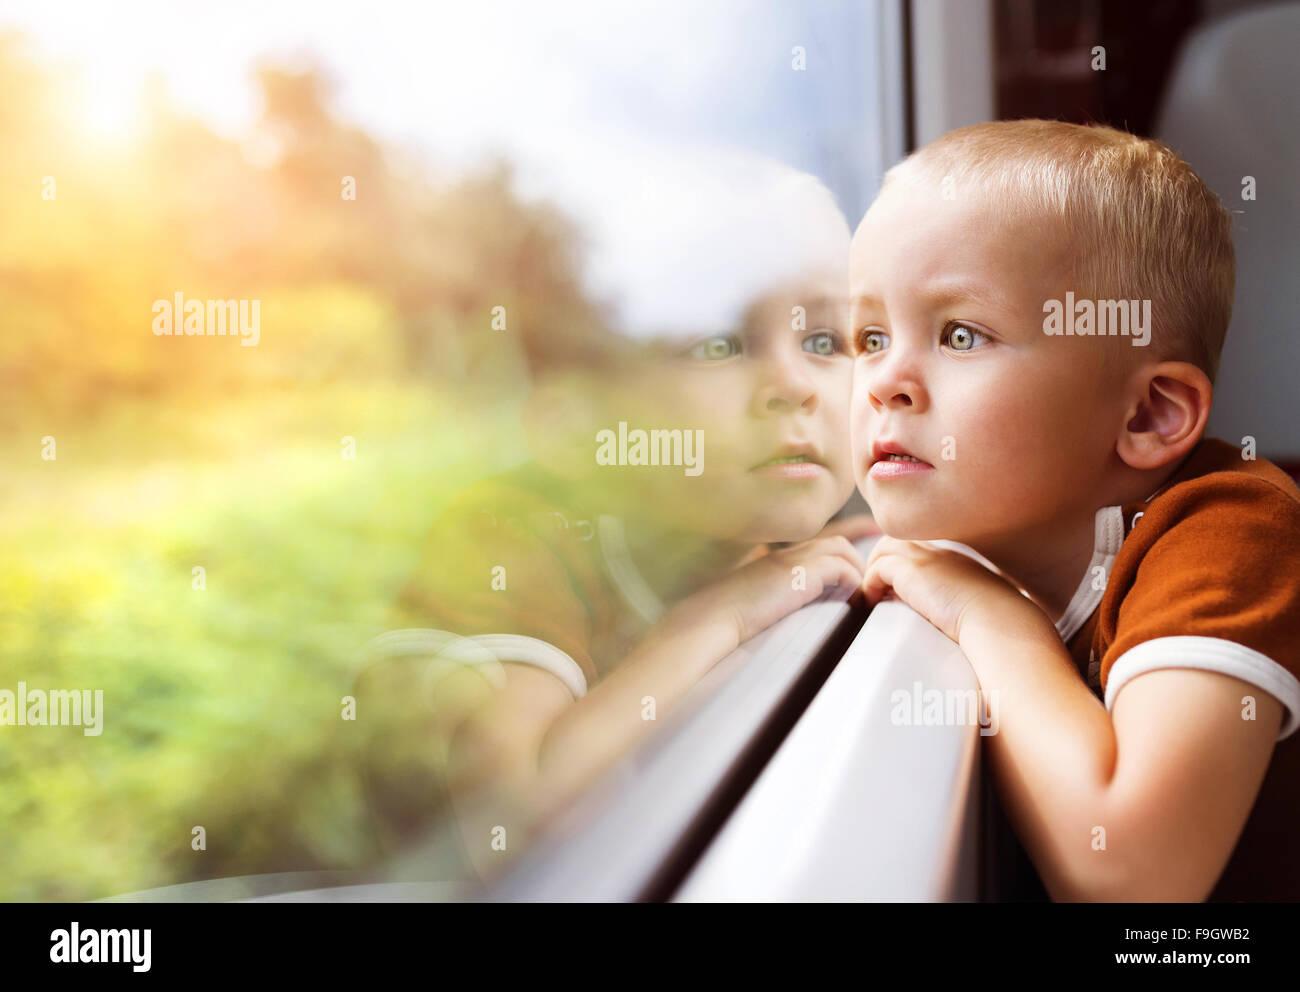 Little boy traveling in train looking outside the window. - Stock Image